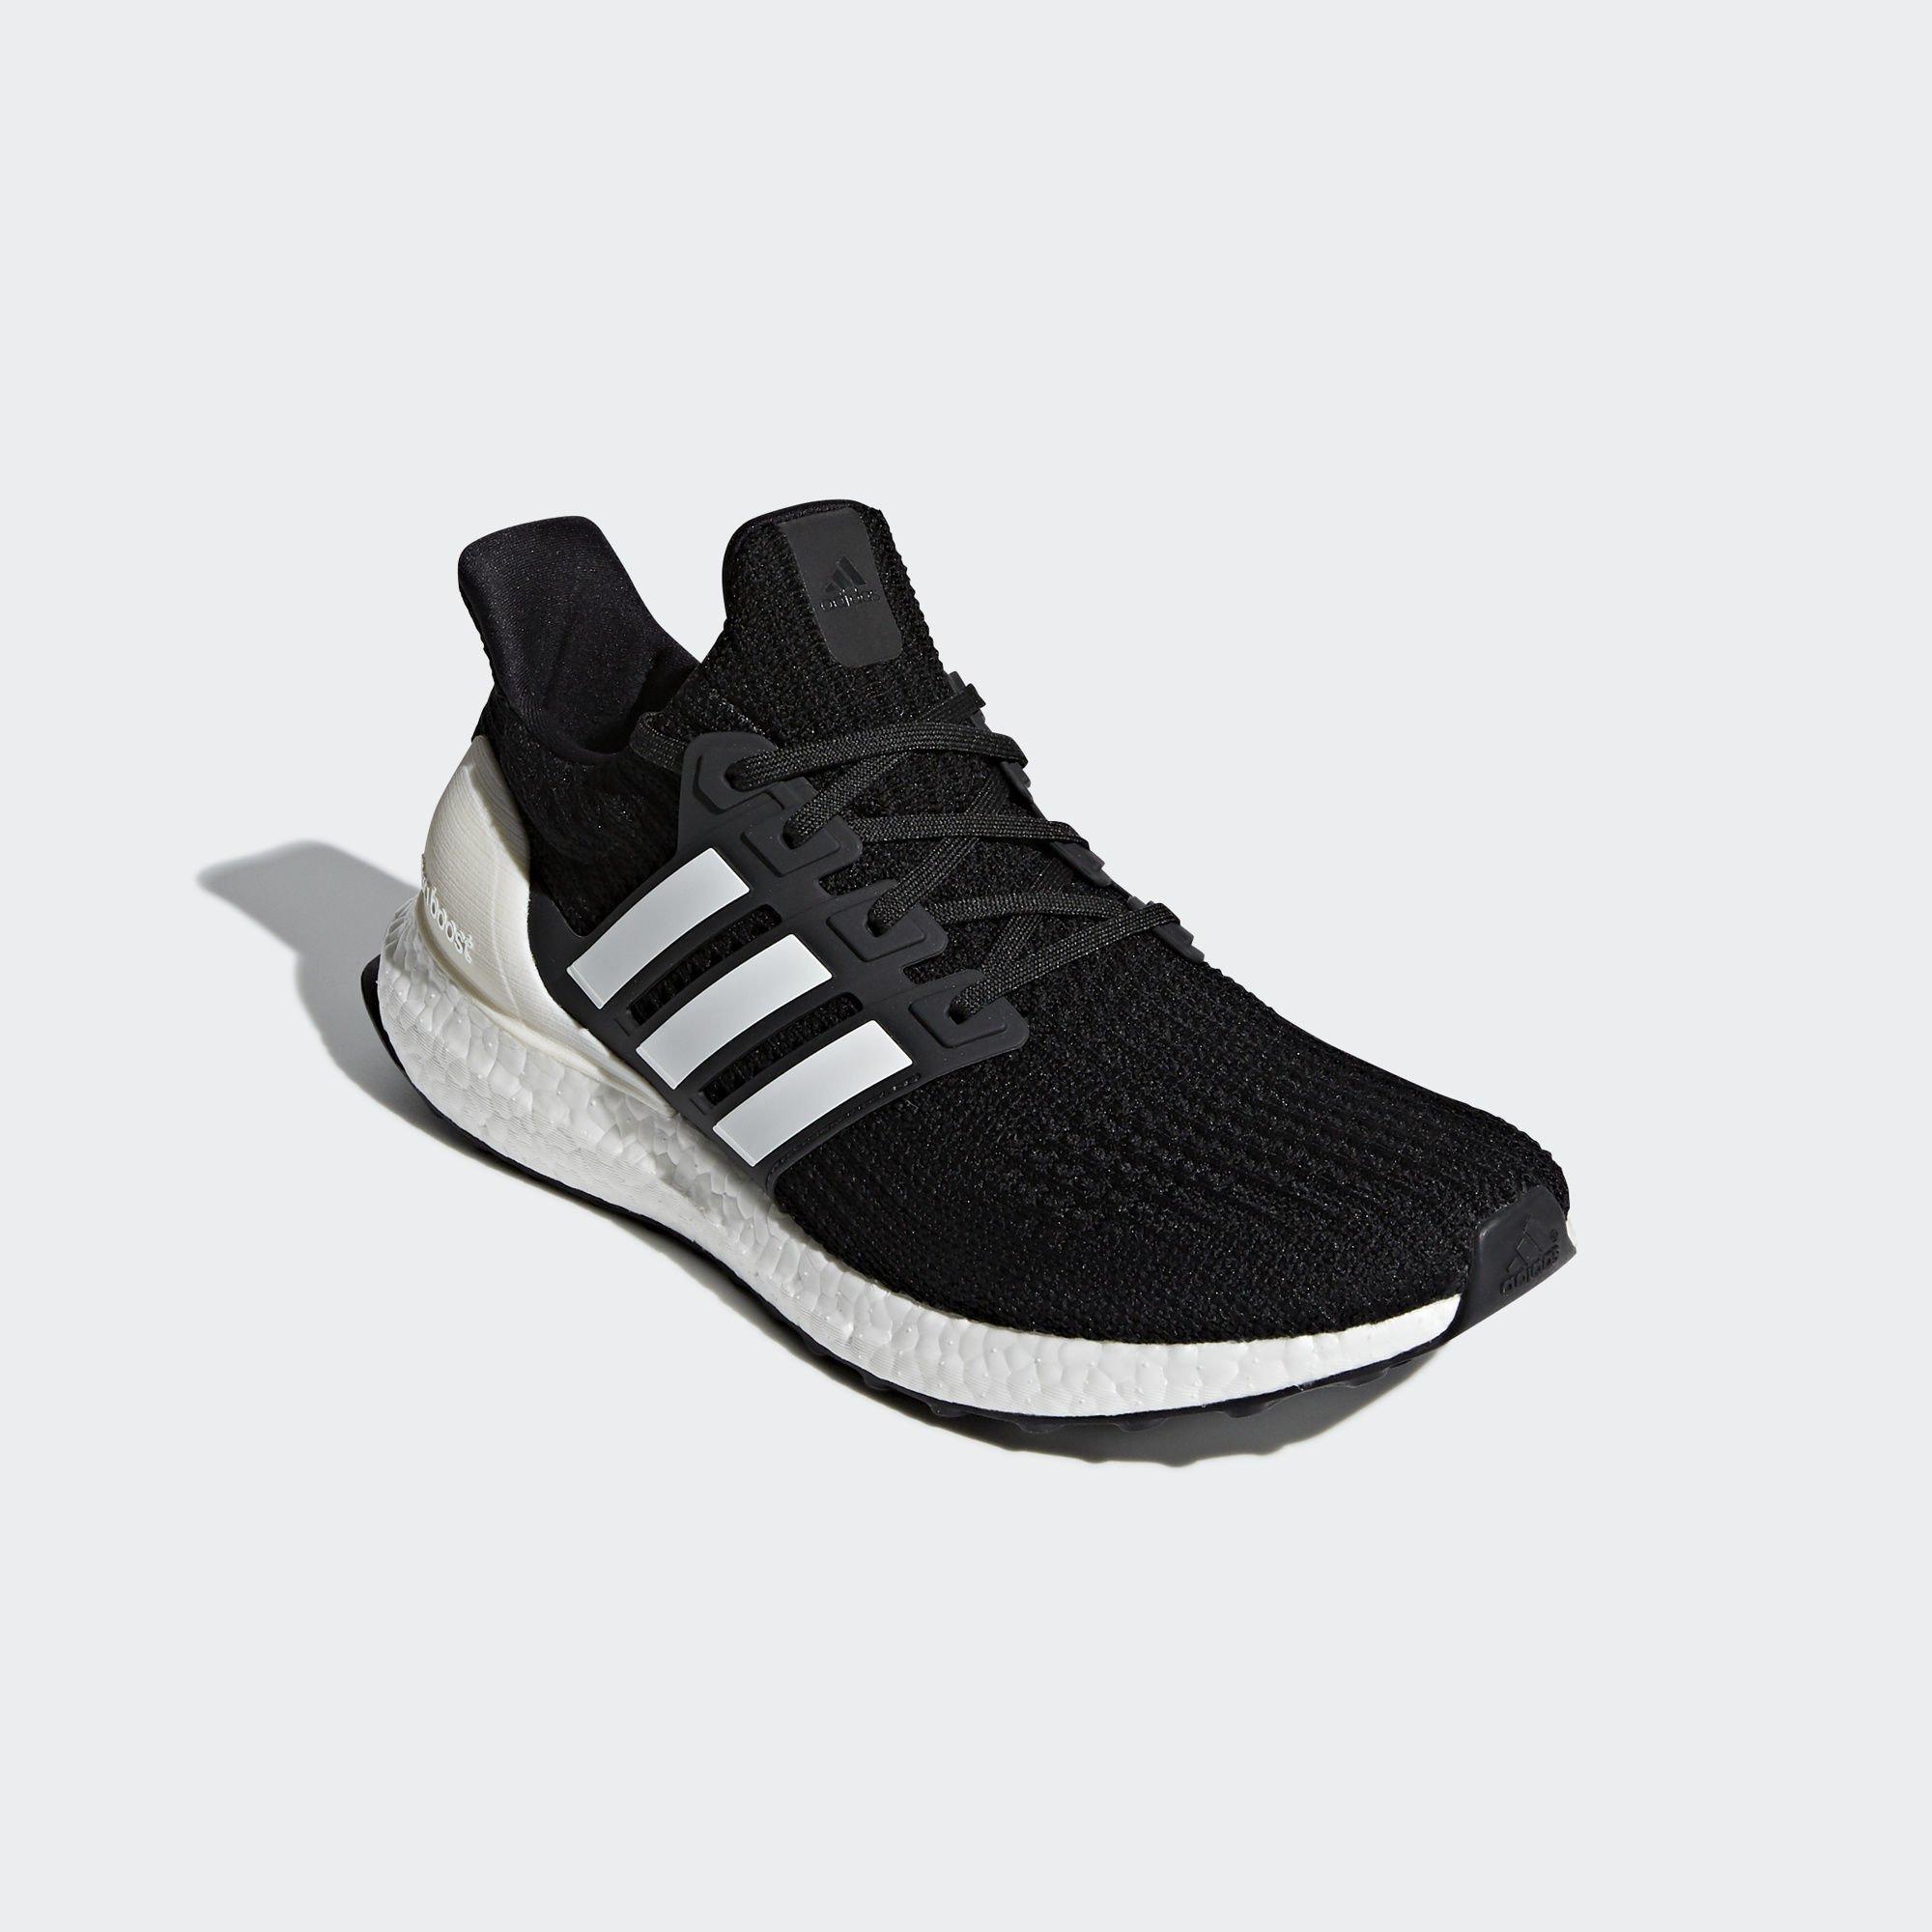 adidas Ultra Boost 4.0 SYS Black